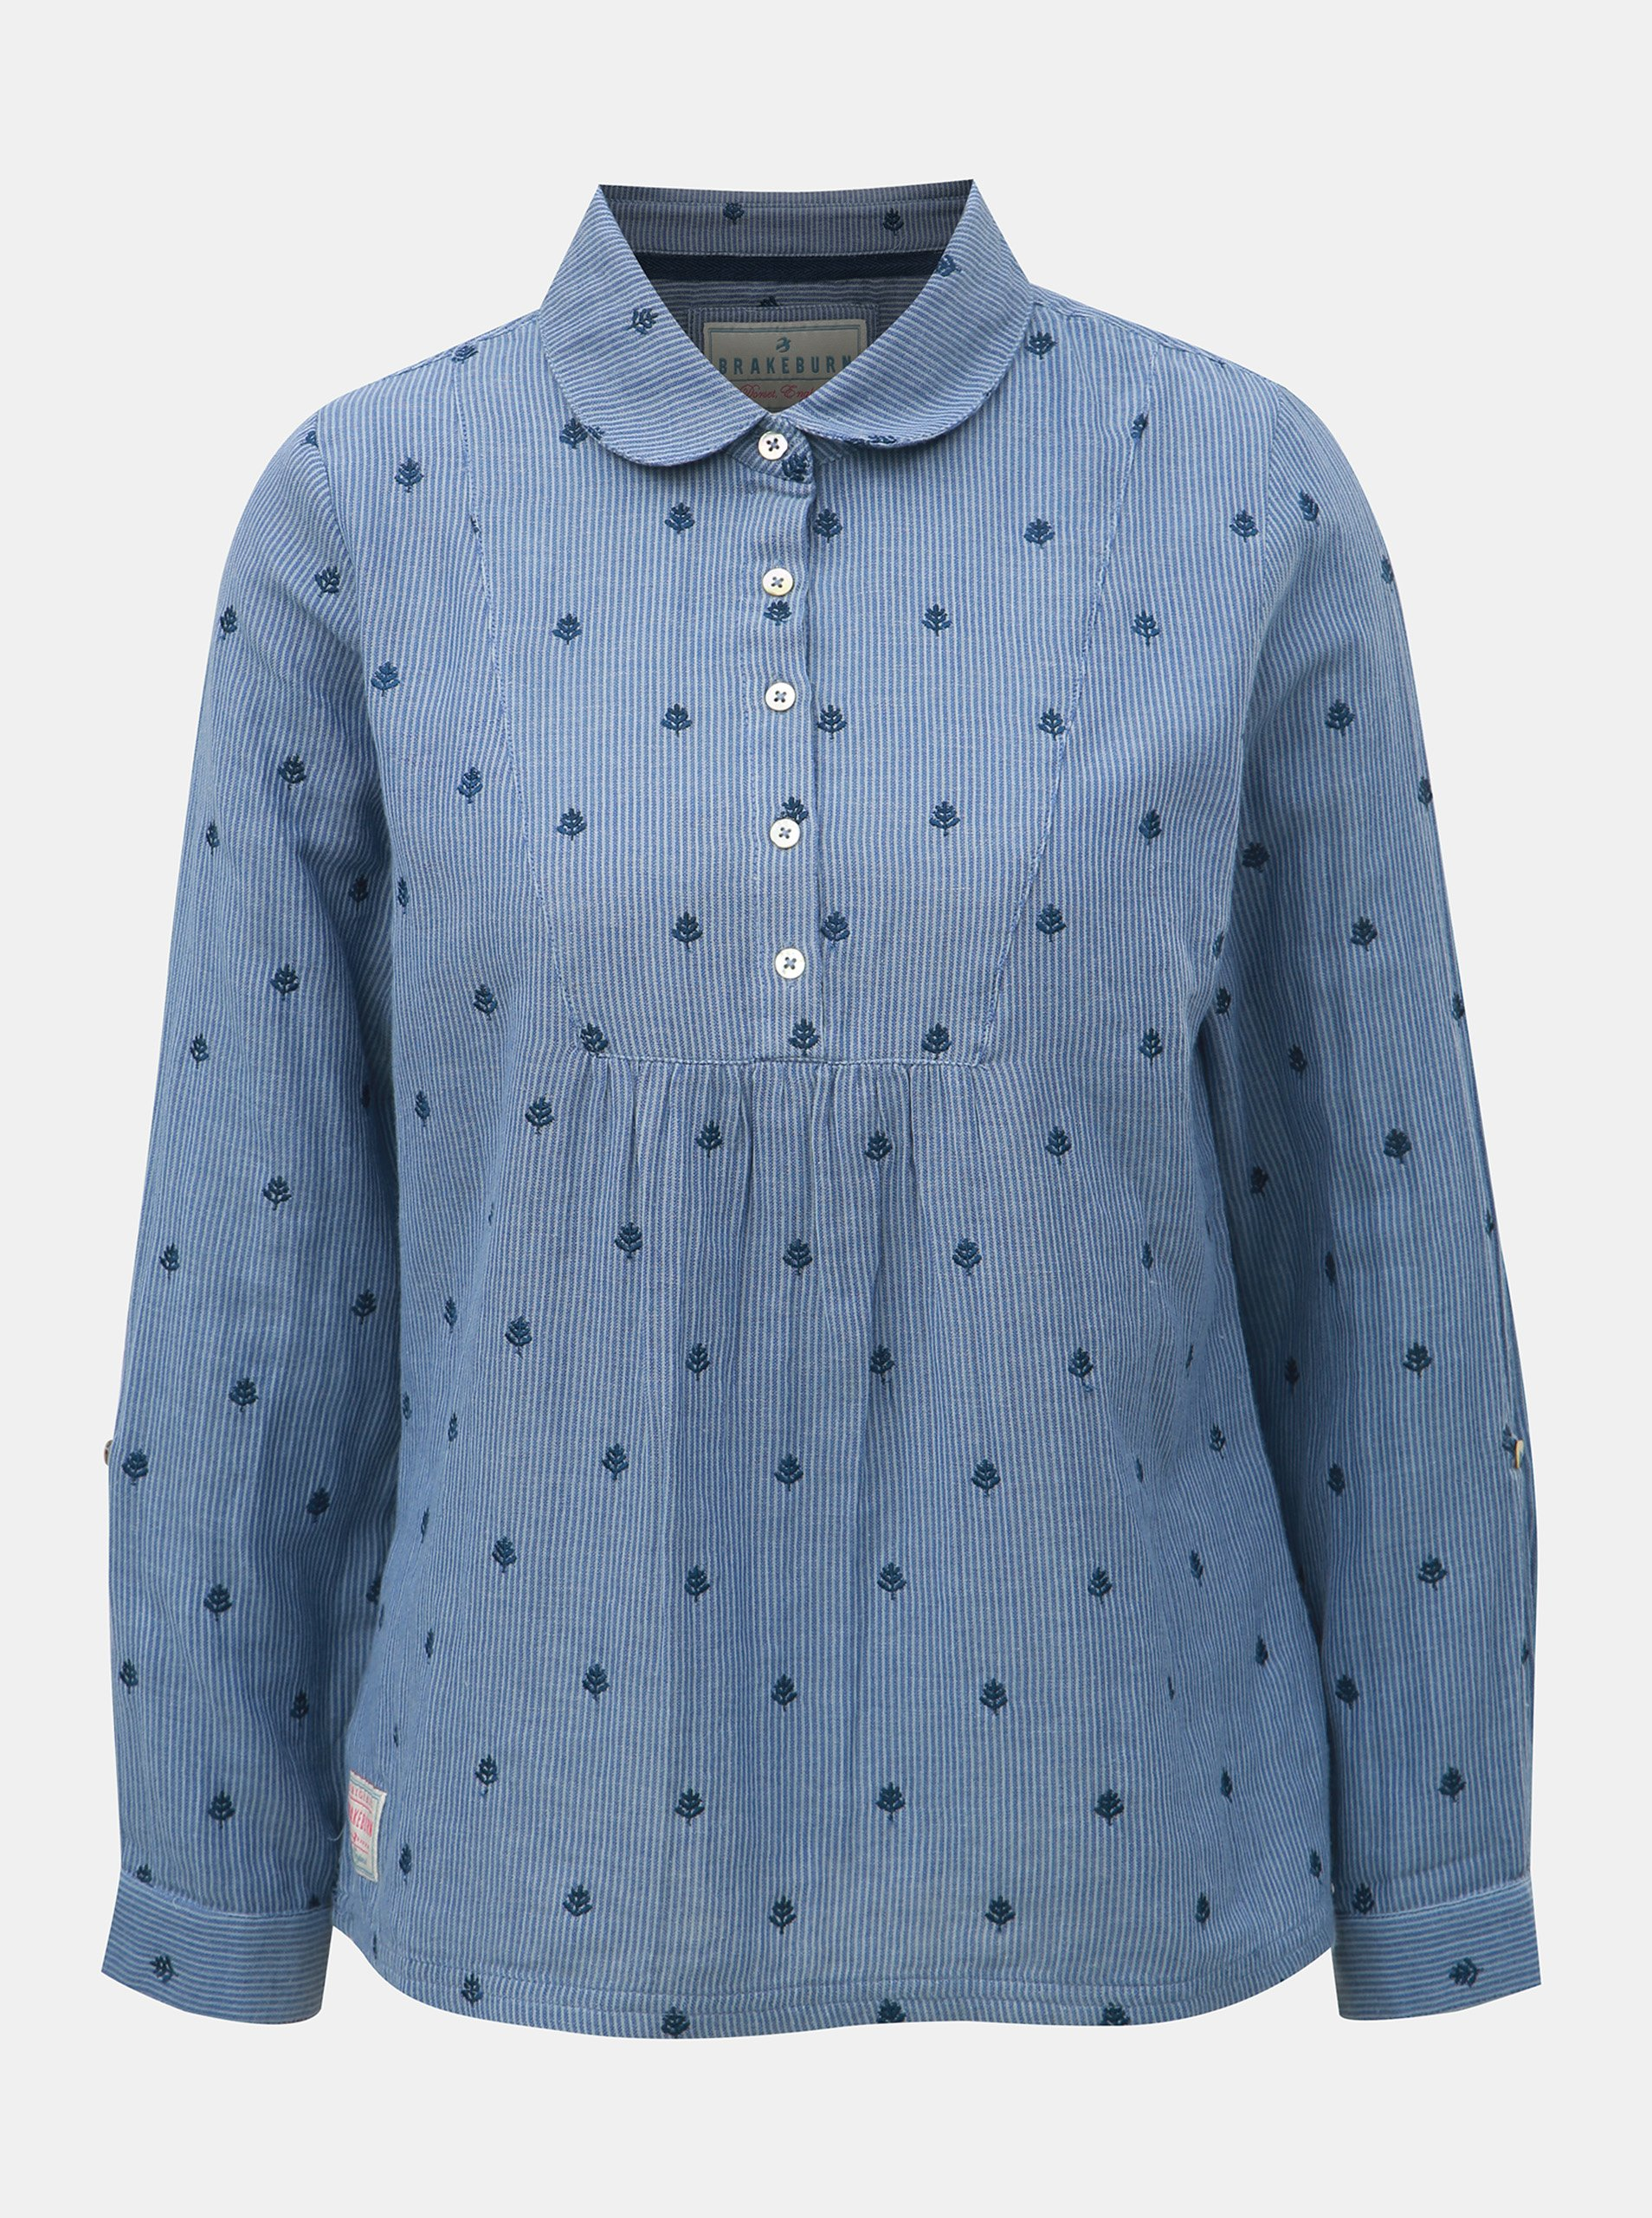 Fotografie Modrá pruhovaná dámská halenka s drobnou výšivkou Brakeburn